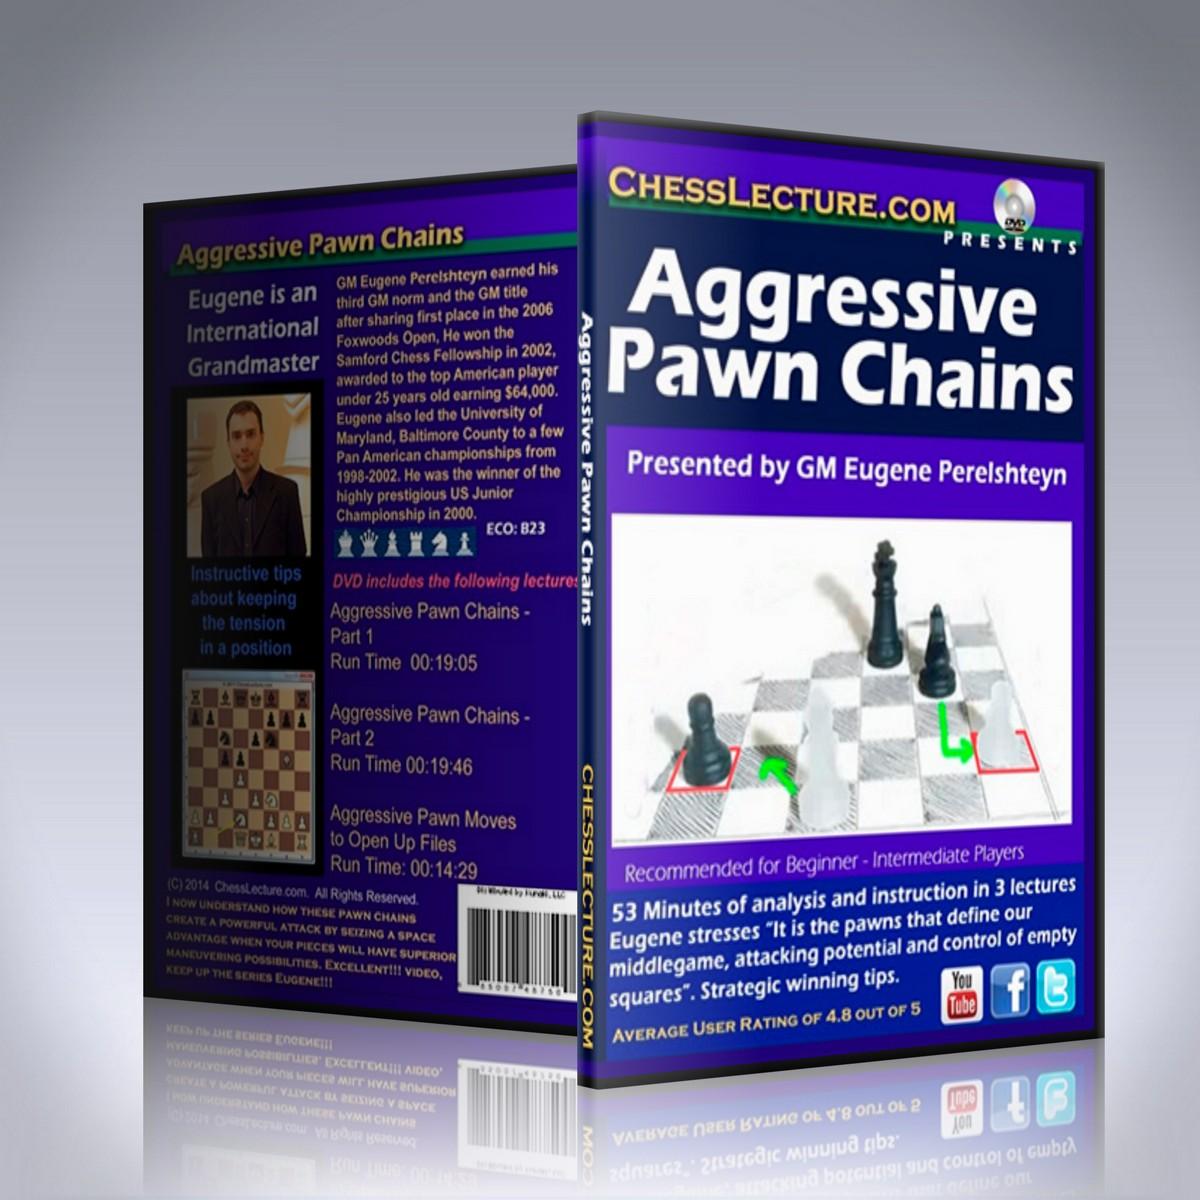 Aggressive Pawn Chains – GM Eugene Perelshteyn